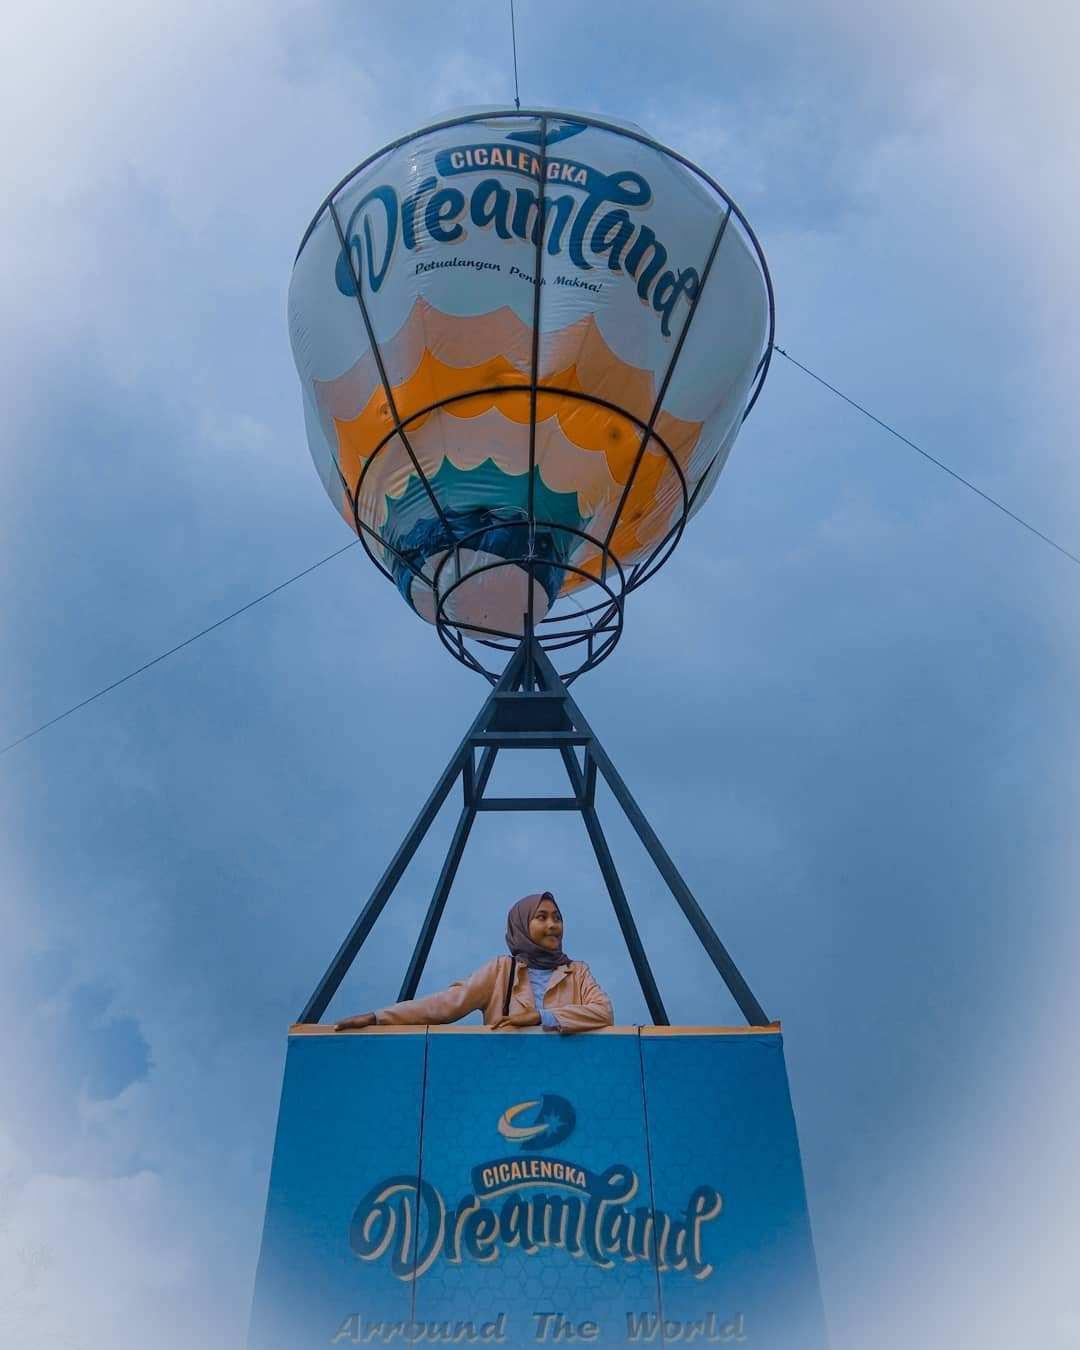 Berfoto di Balon Gas Yang ada di Cicalengka Dreamland, Image From @ngyeniii_072